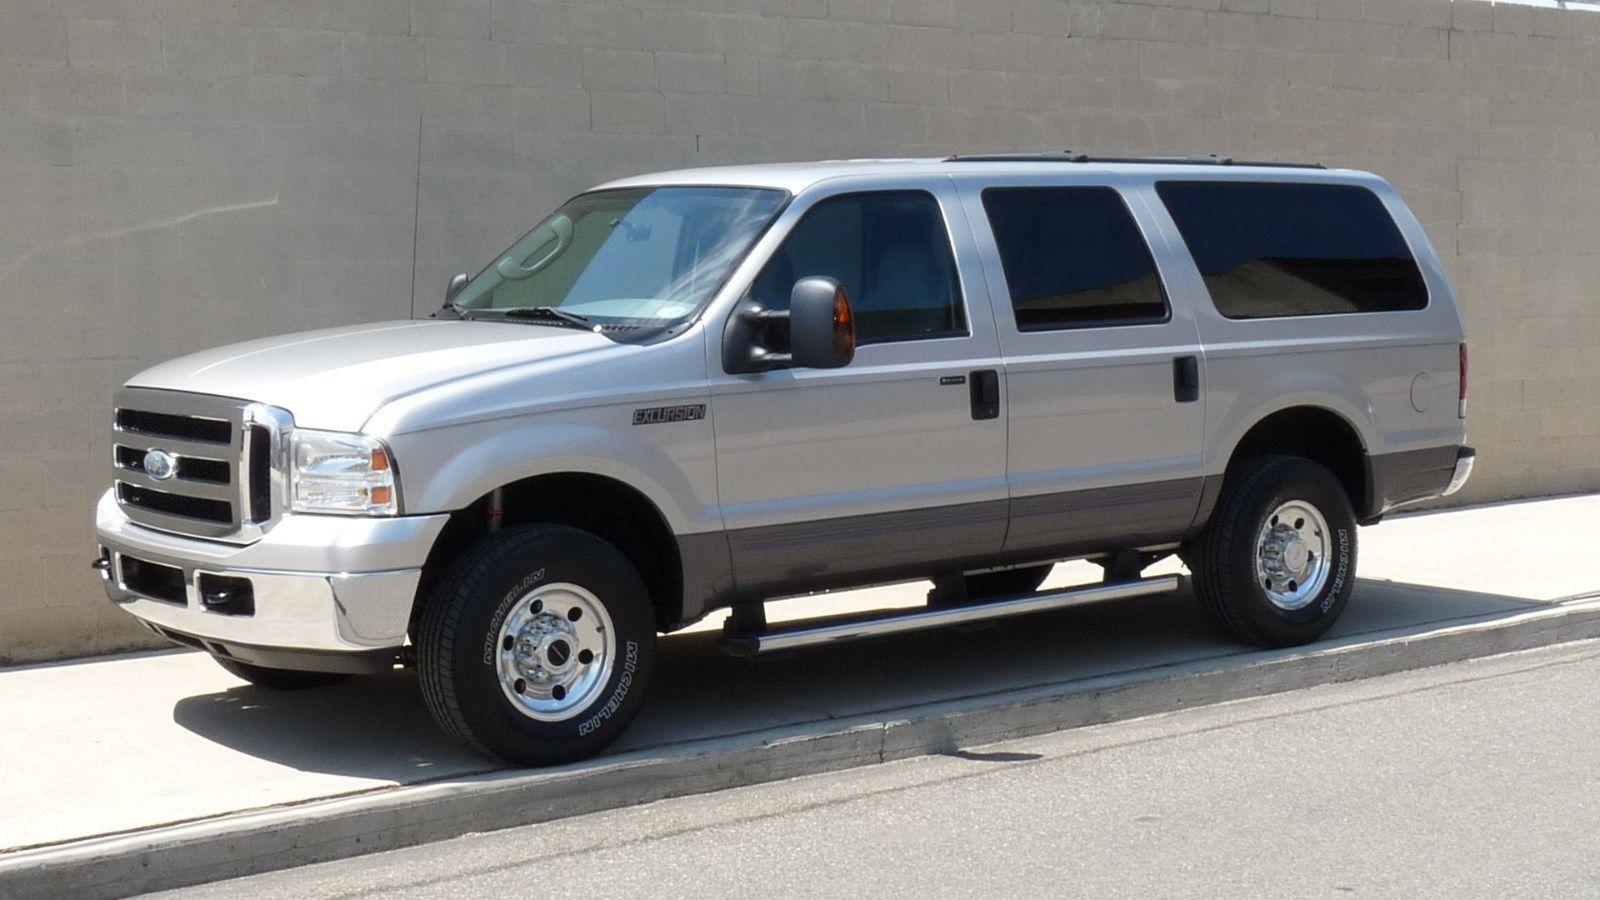 2005 Ford Excursion Xlt 4wd 2005 Ford Excursion Xlt 4wd 6 0l Turbo